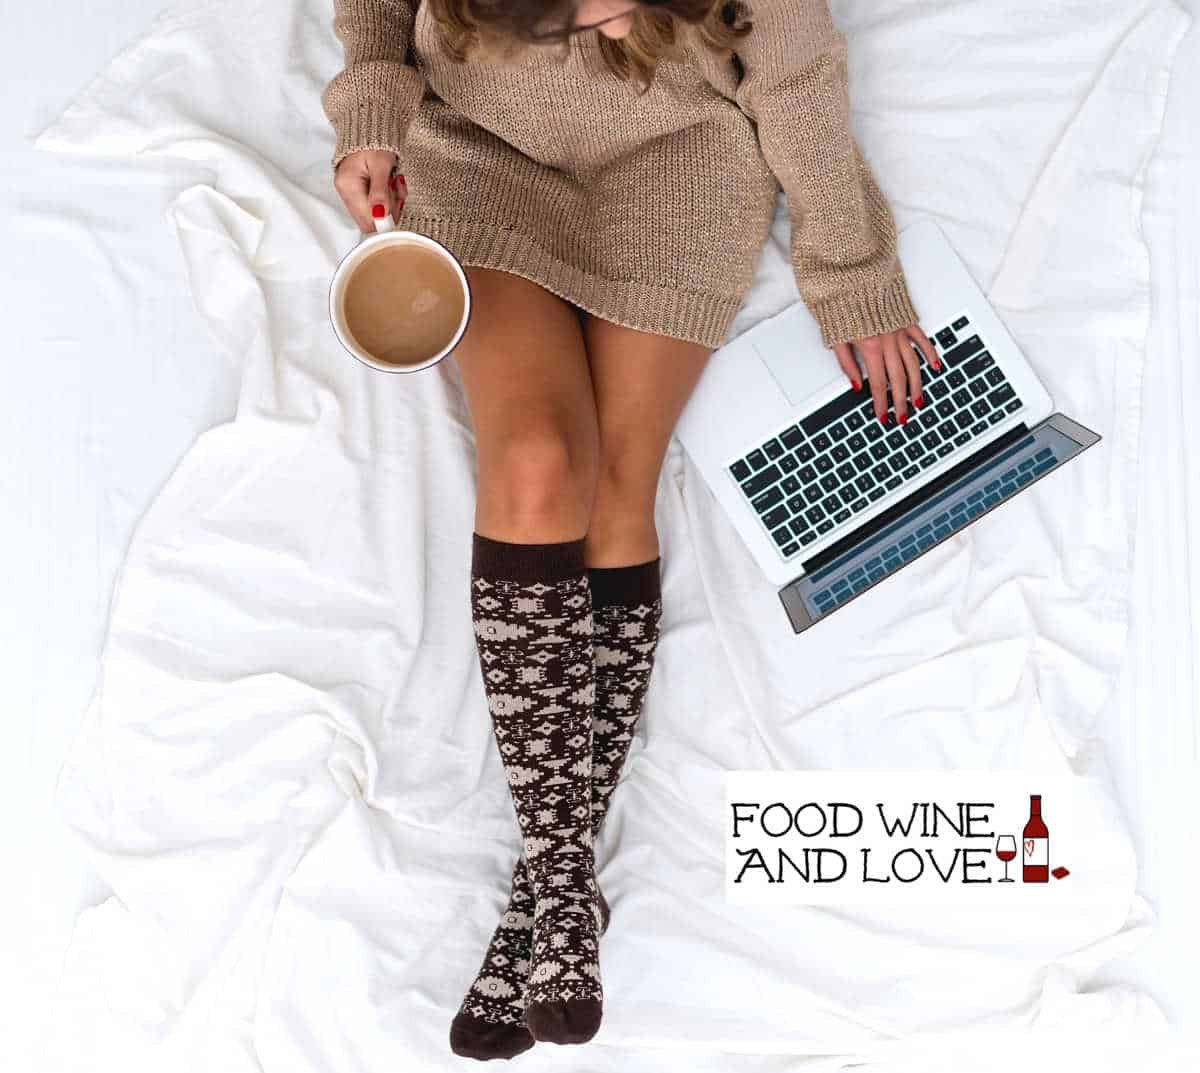 Food Wine and Love